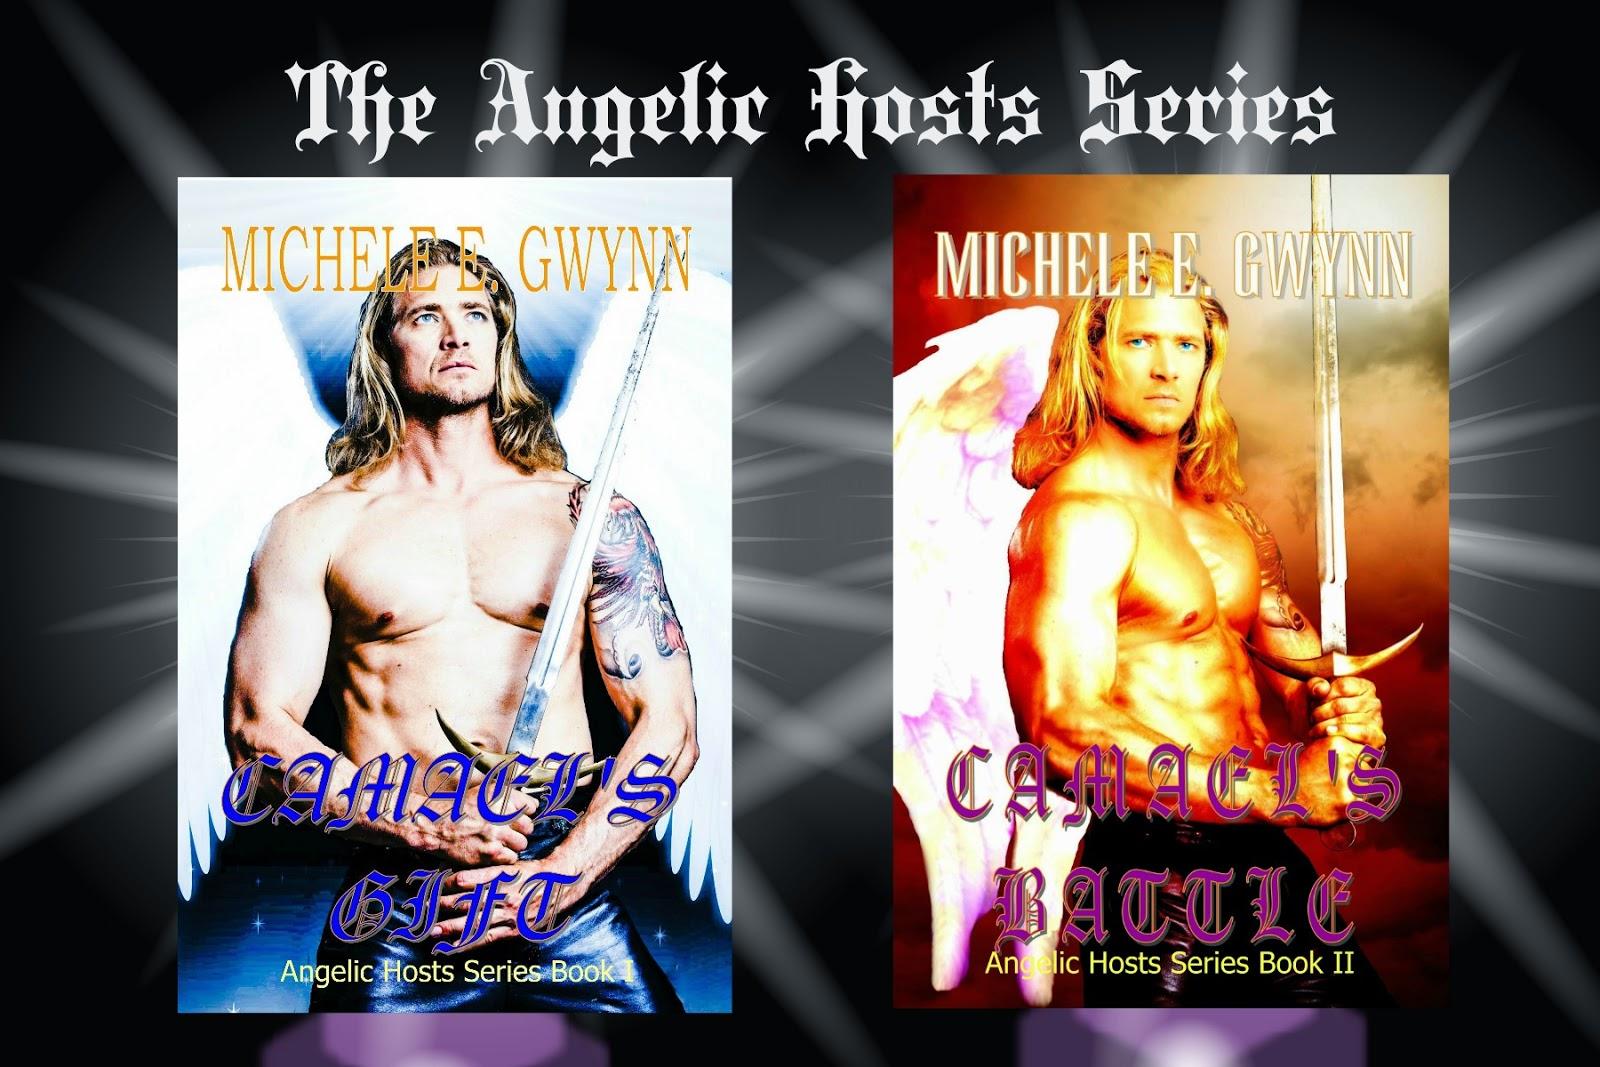 http://www.amazon.com/Camaels-Gift-Angelic-Hosts-Series-ebook/dp/B00O0MGD1E/ref=pd_rhf_dp_p_img_5